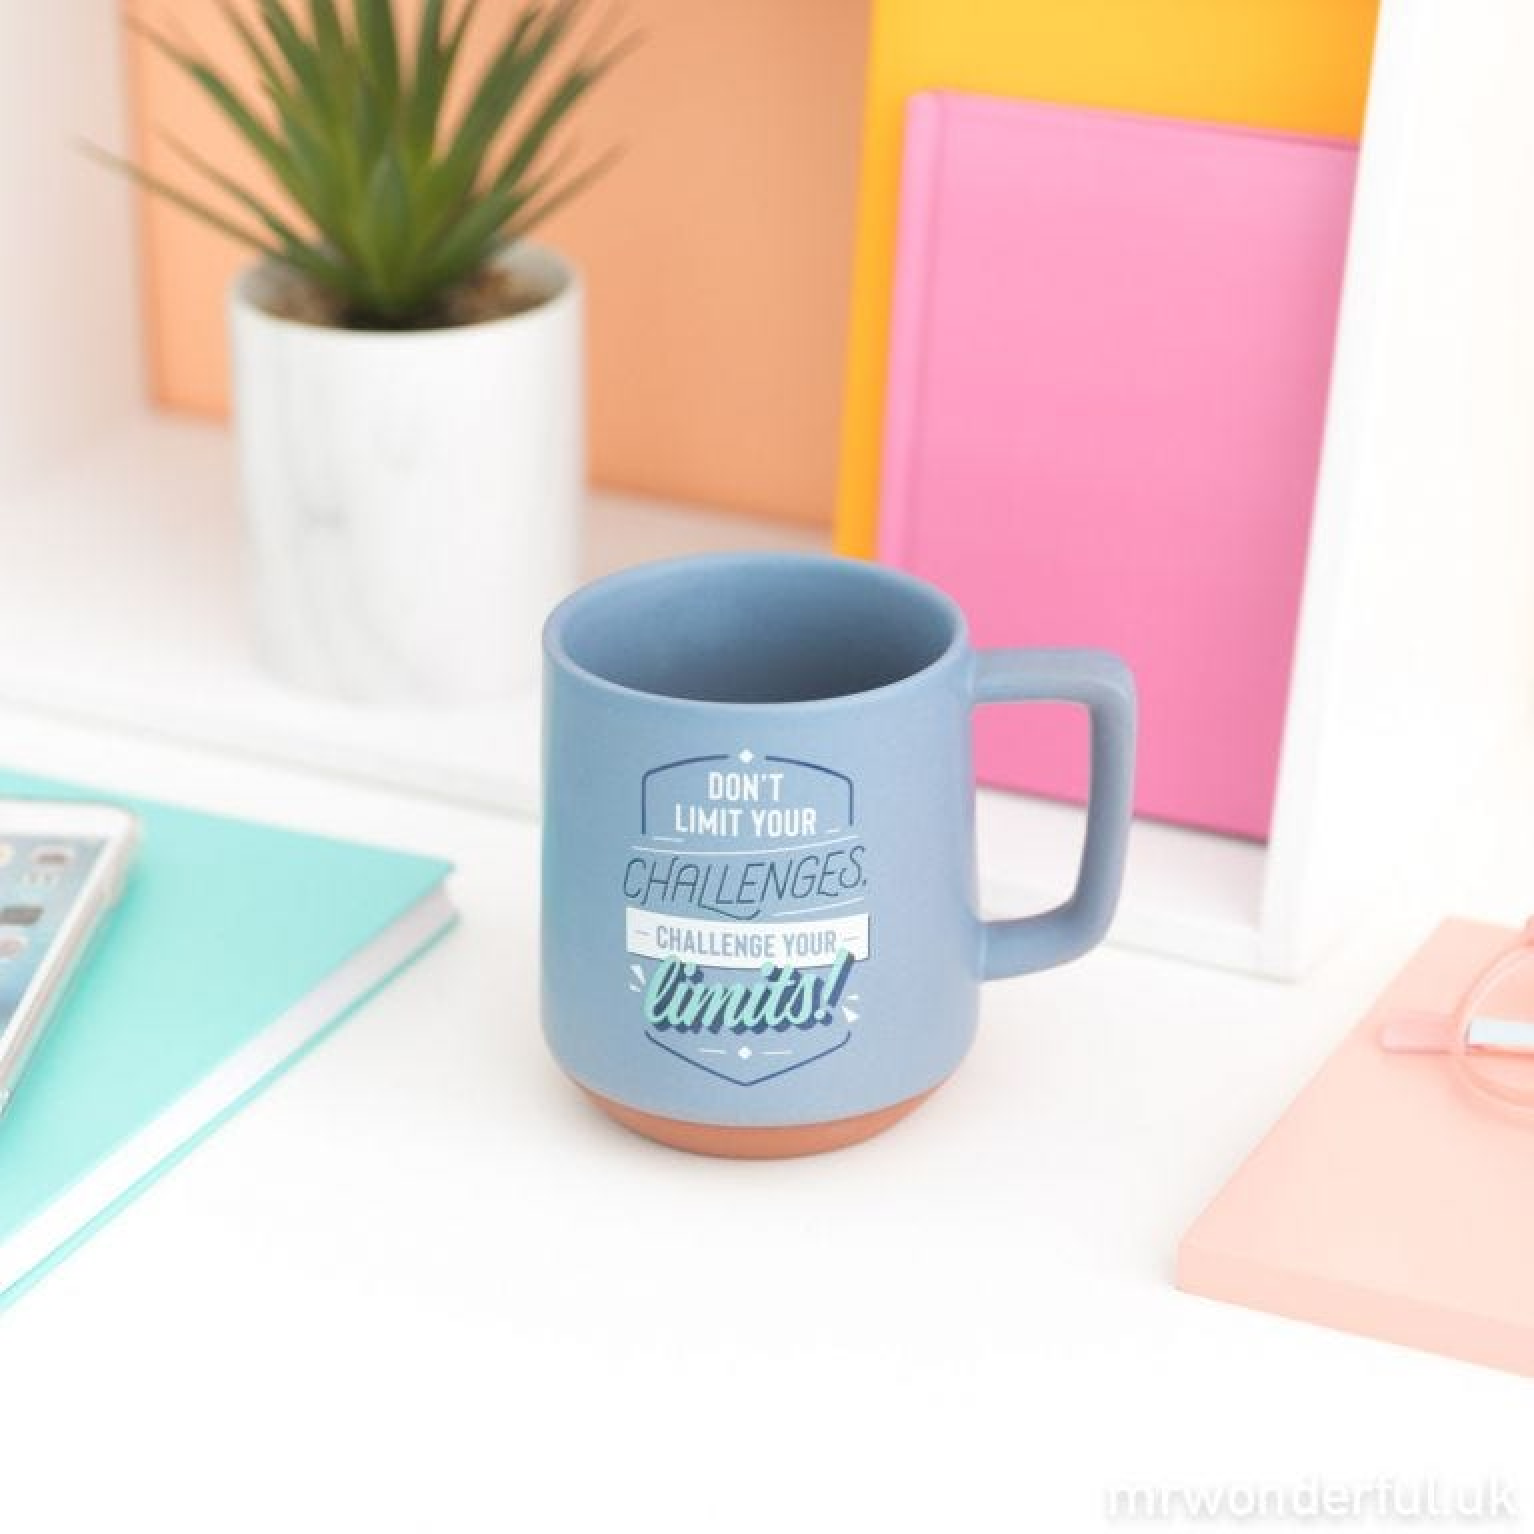 Mug - Don't limit your challenges, challenge your limits!